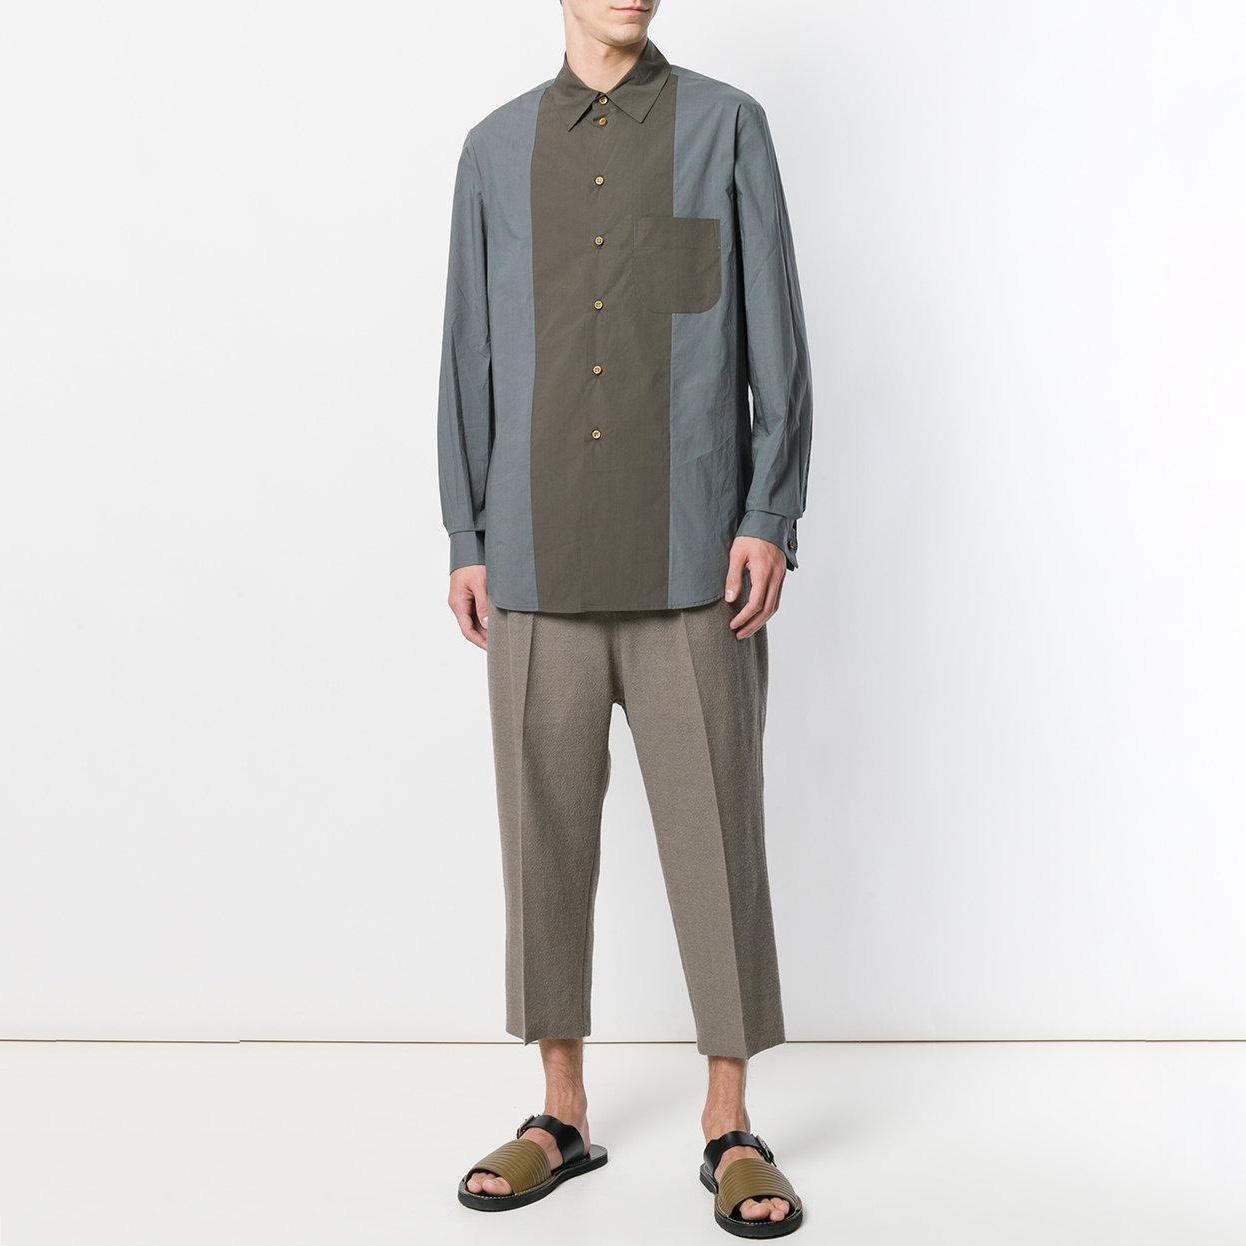 uma-wang-Green-Contrast-Fitted-Shirt (3).jpg